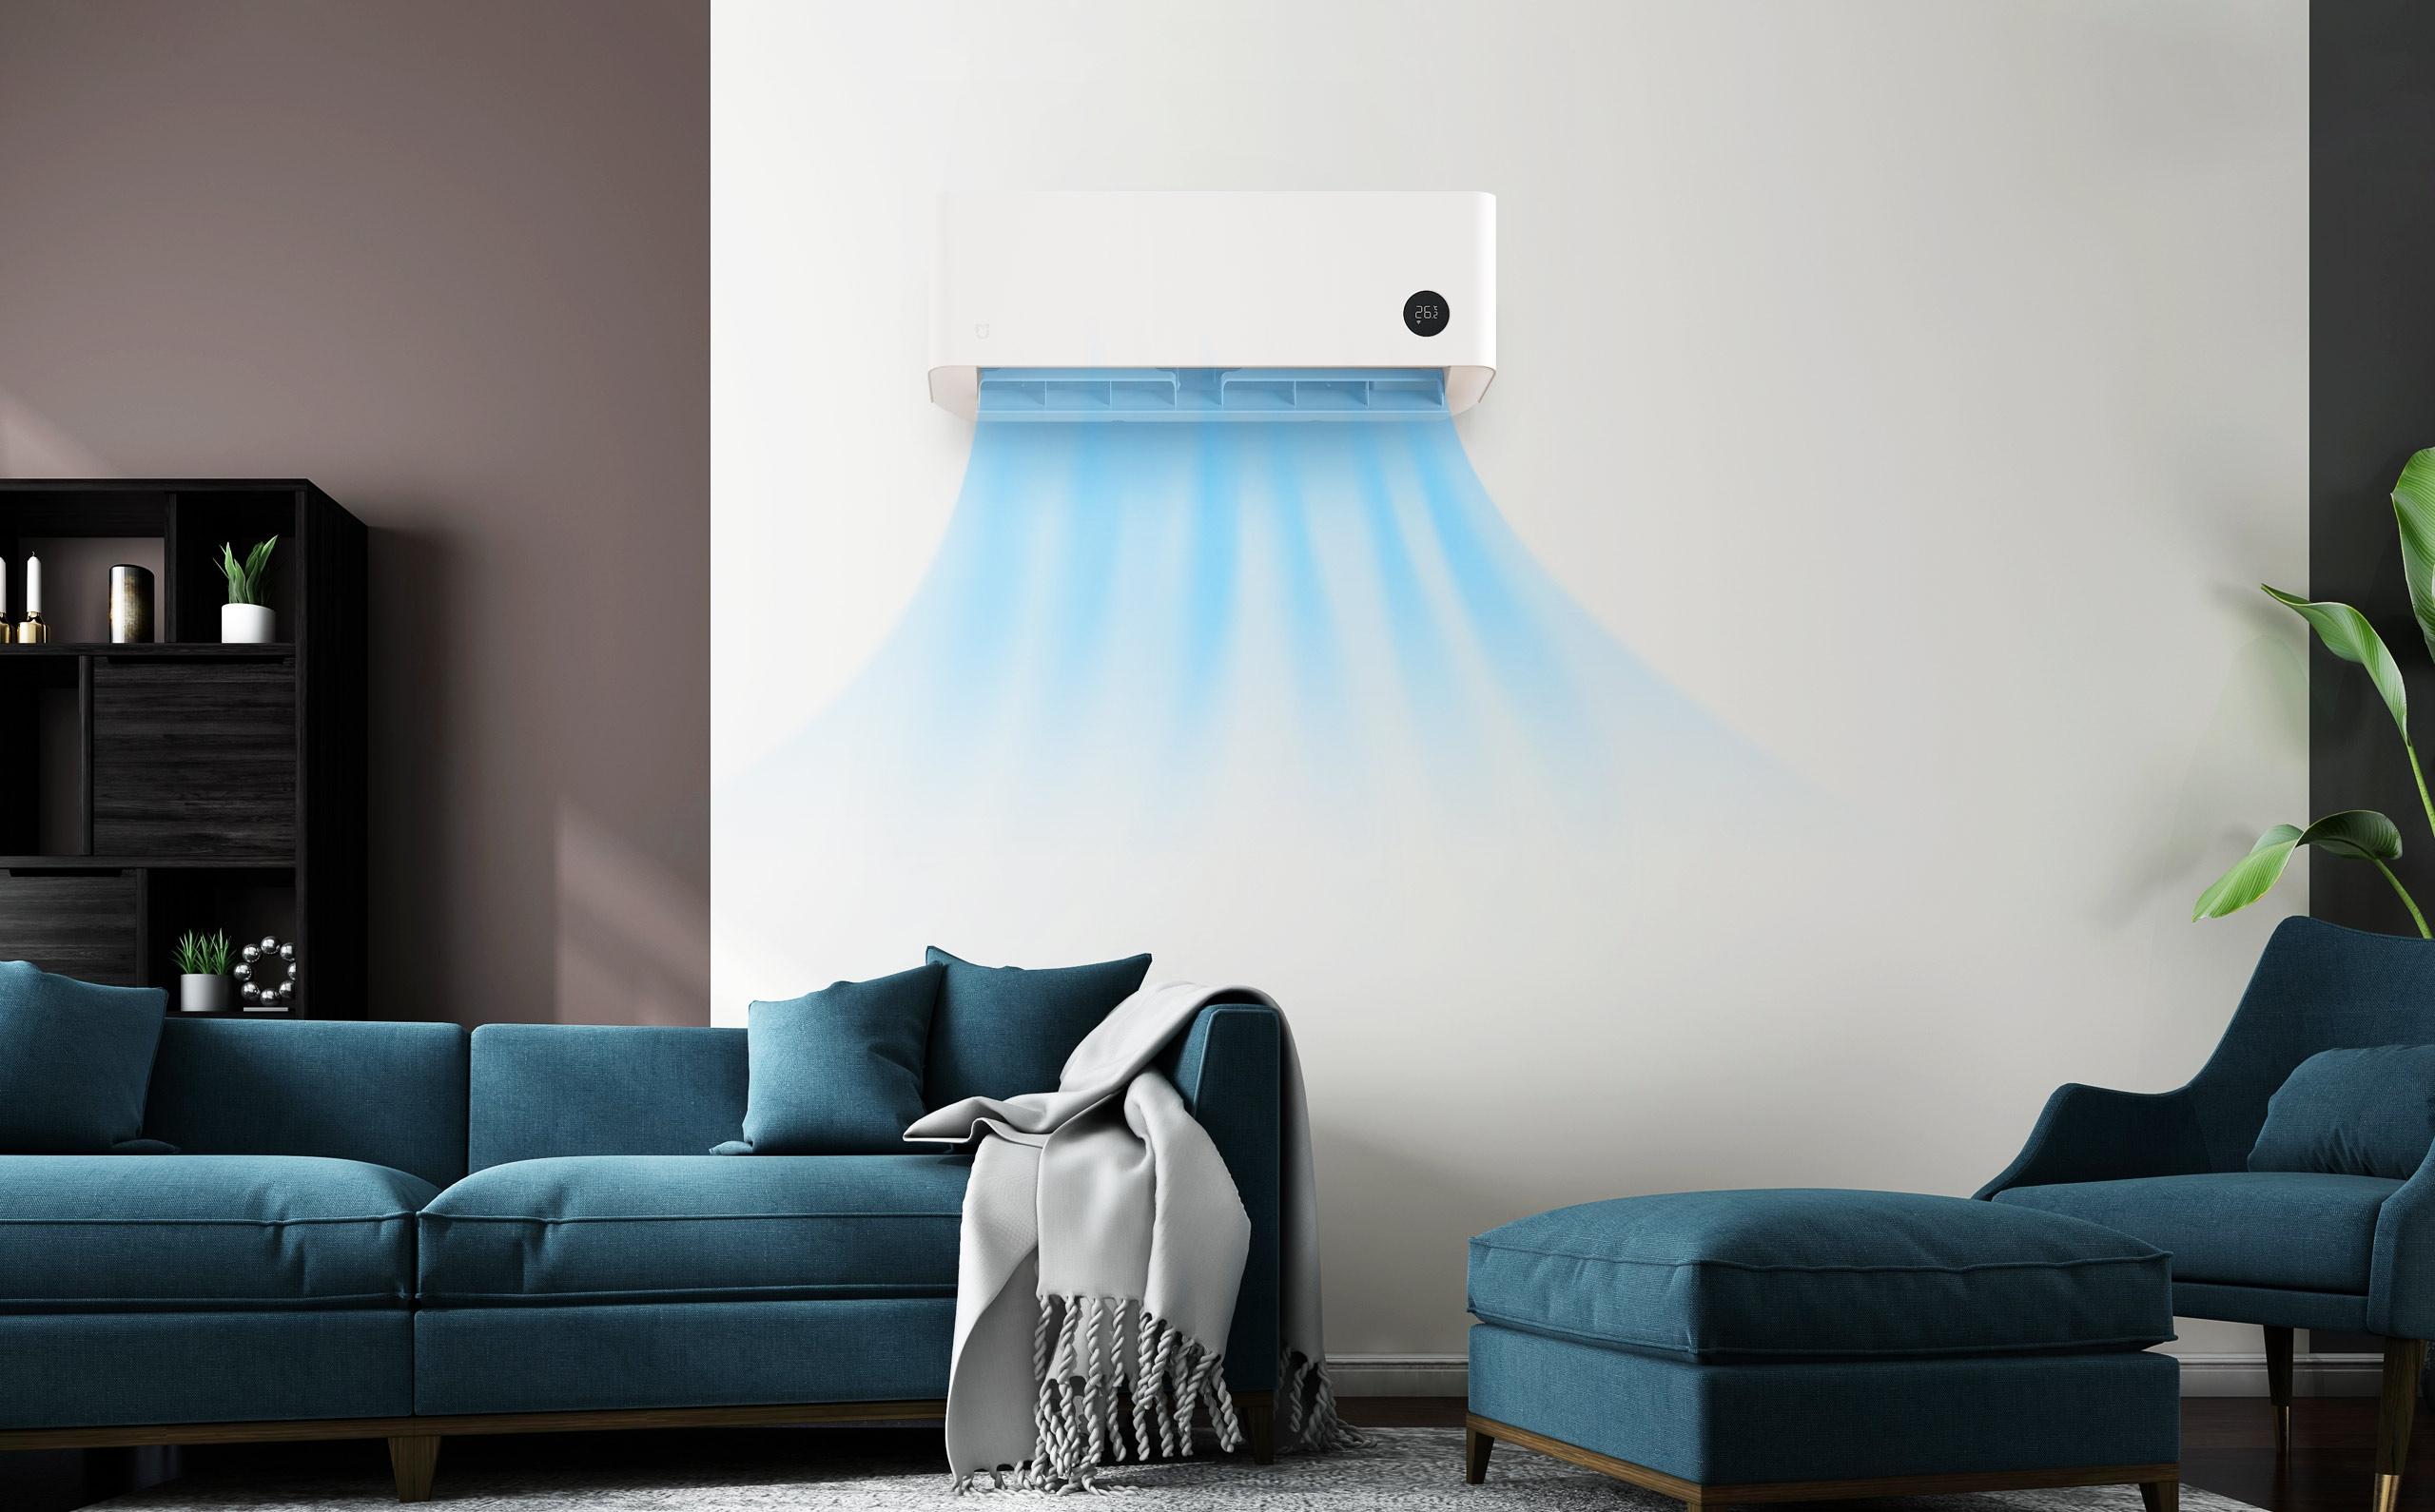 Xiaomi Mijia Internet Air Conditioner